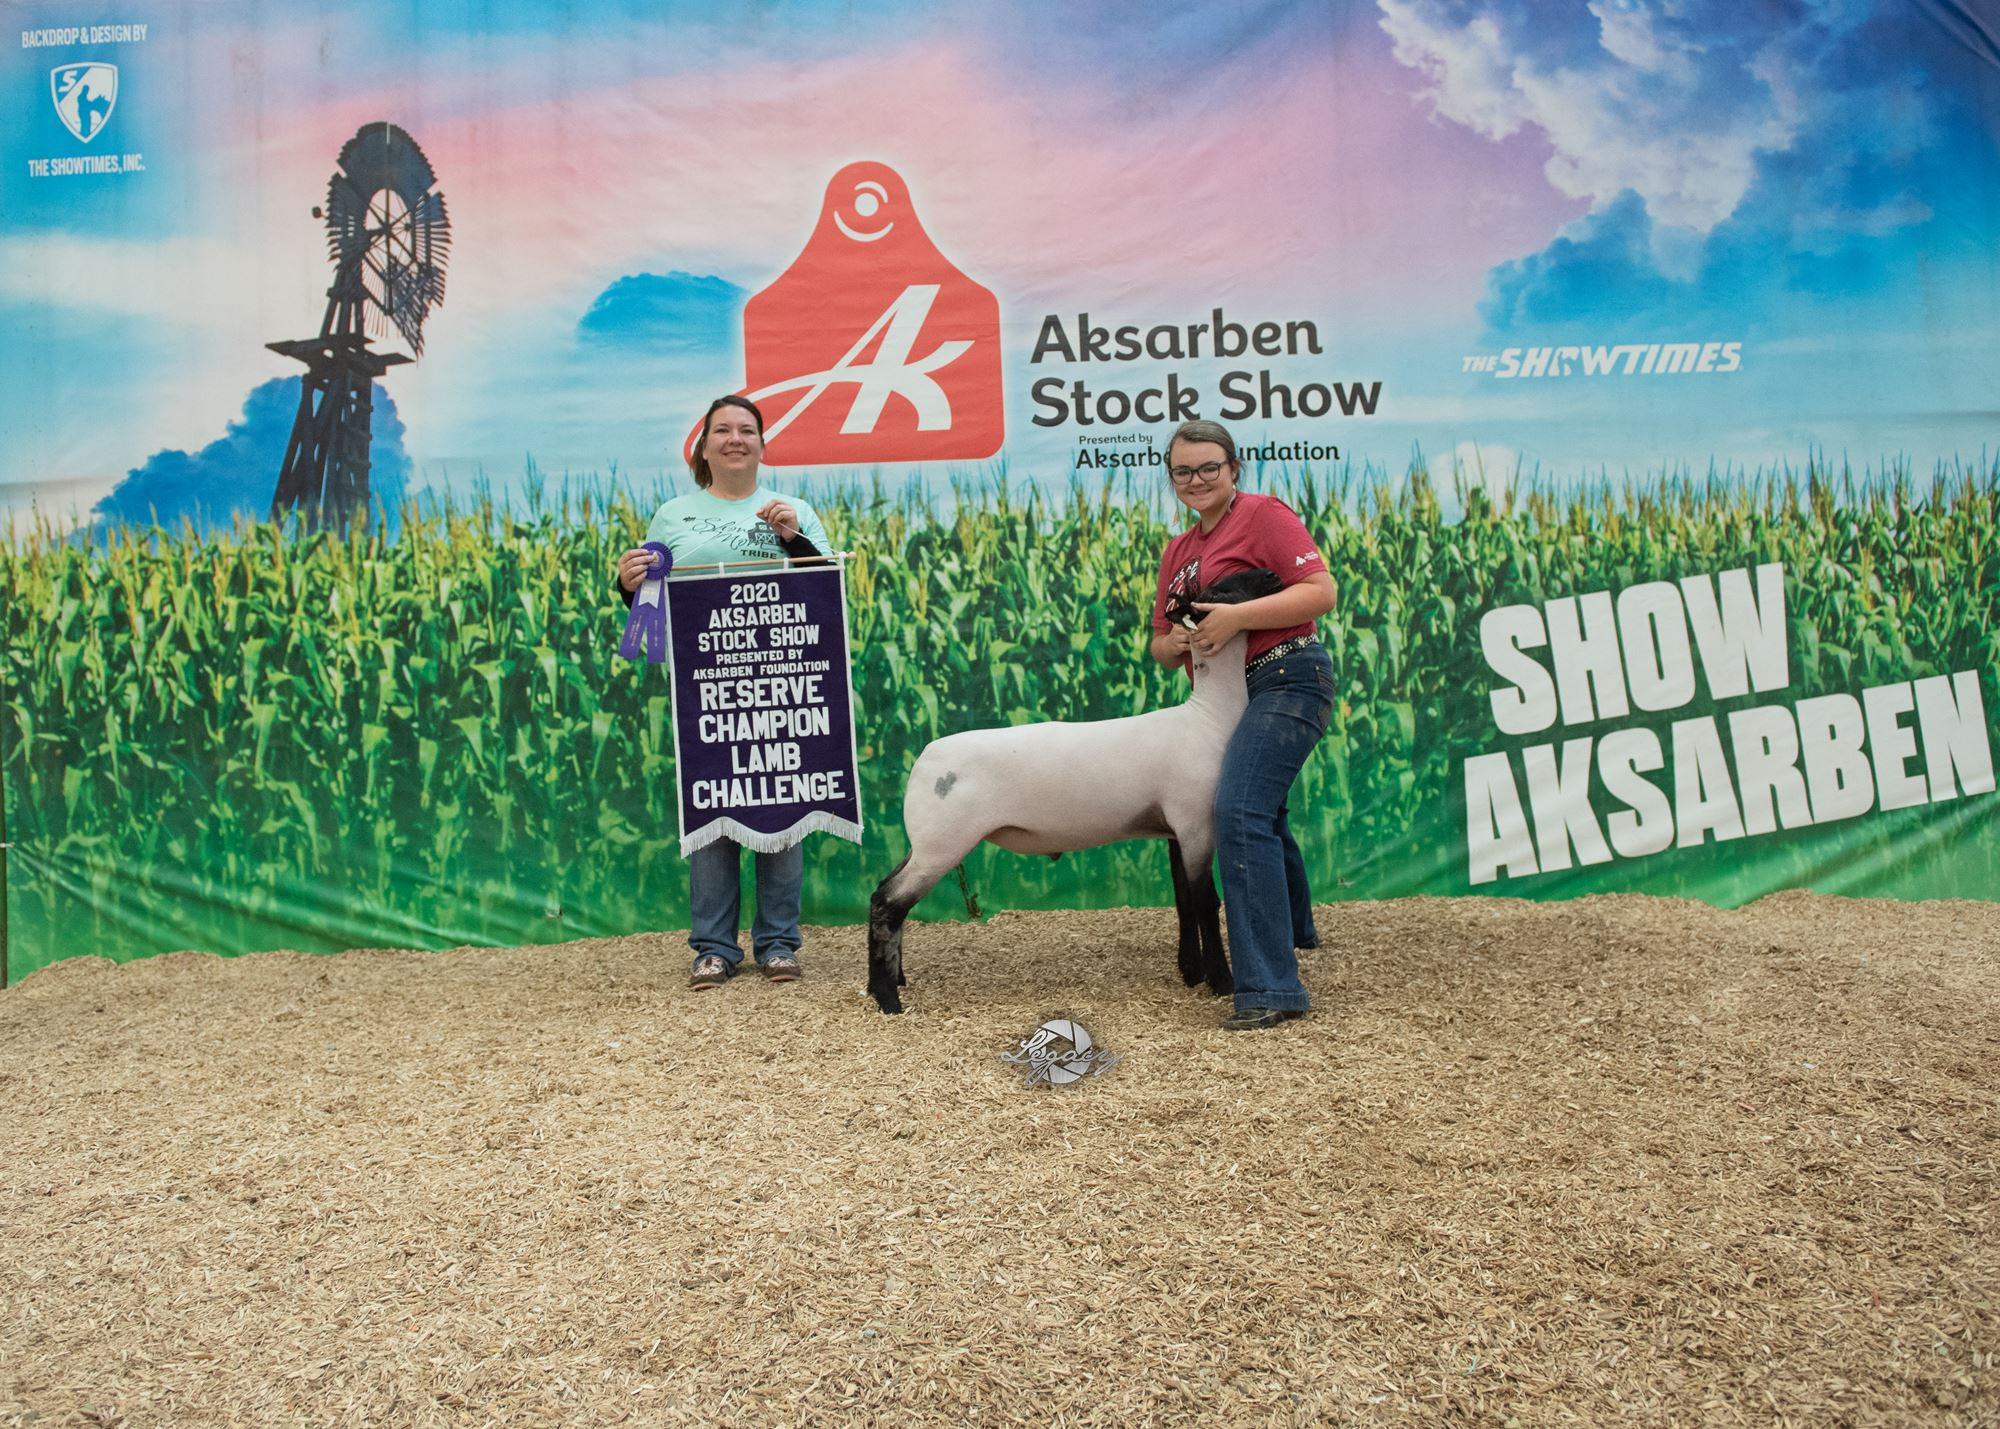 Reserve Champion Lamb Challenge